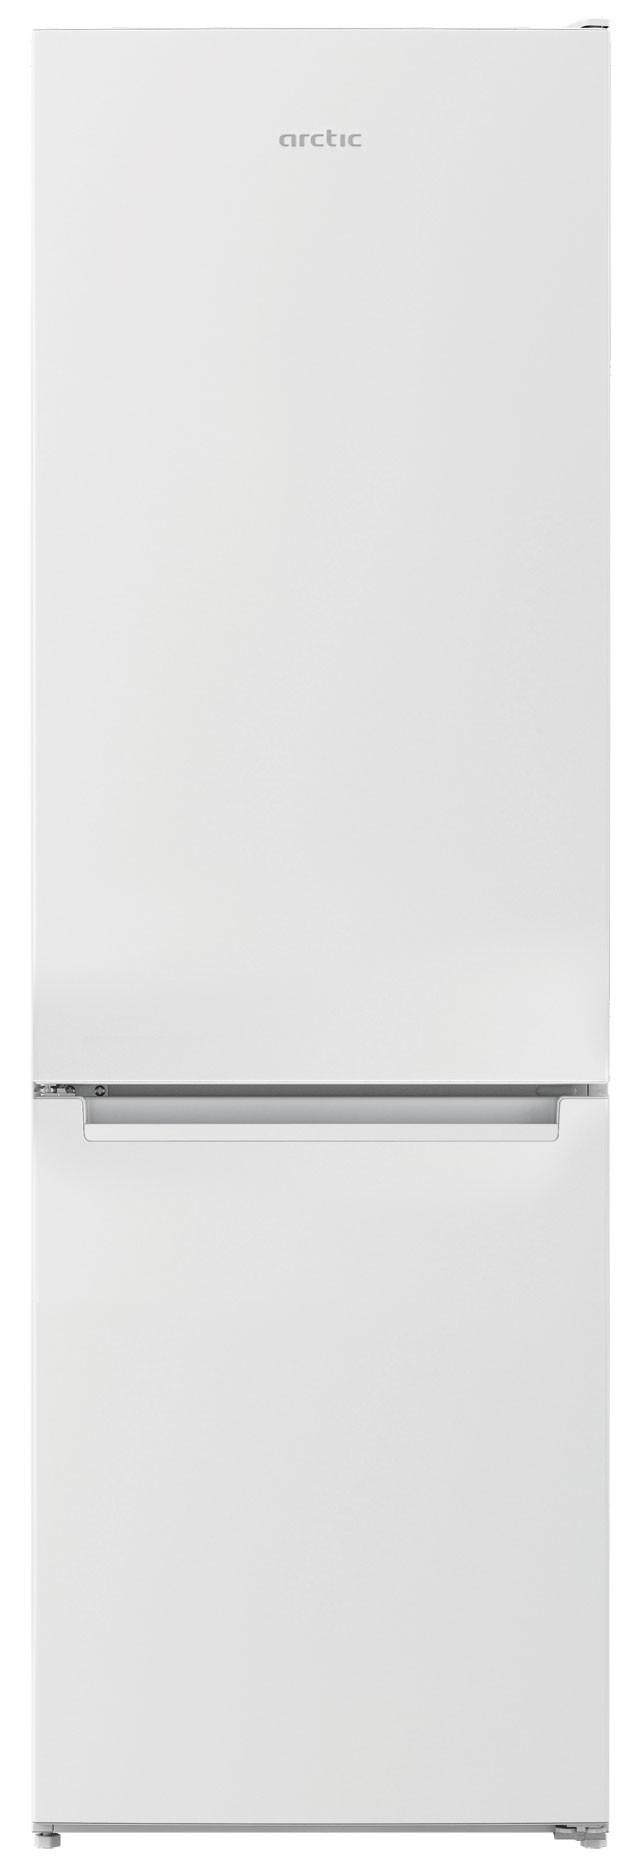 Combina frigorifica, Arctic, AK54270M30W, 262 l, Clasa F, H 170,8  cm, Alb